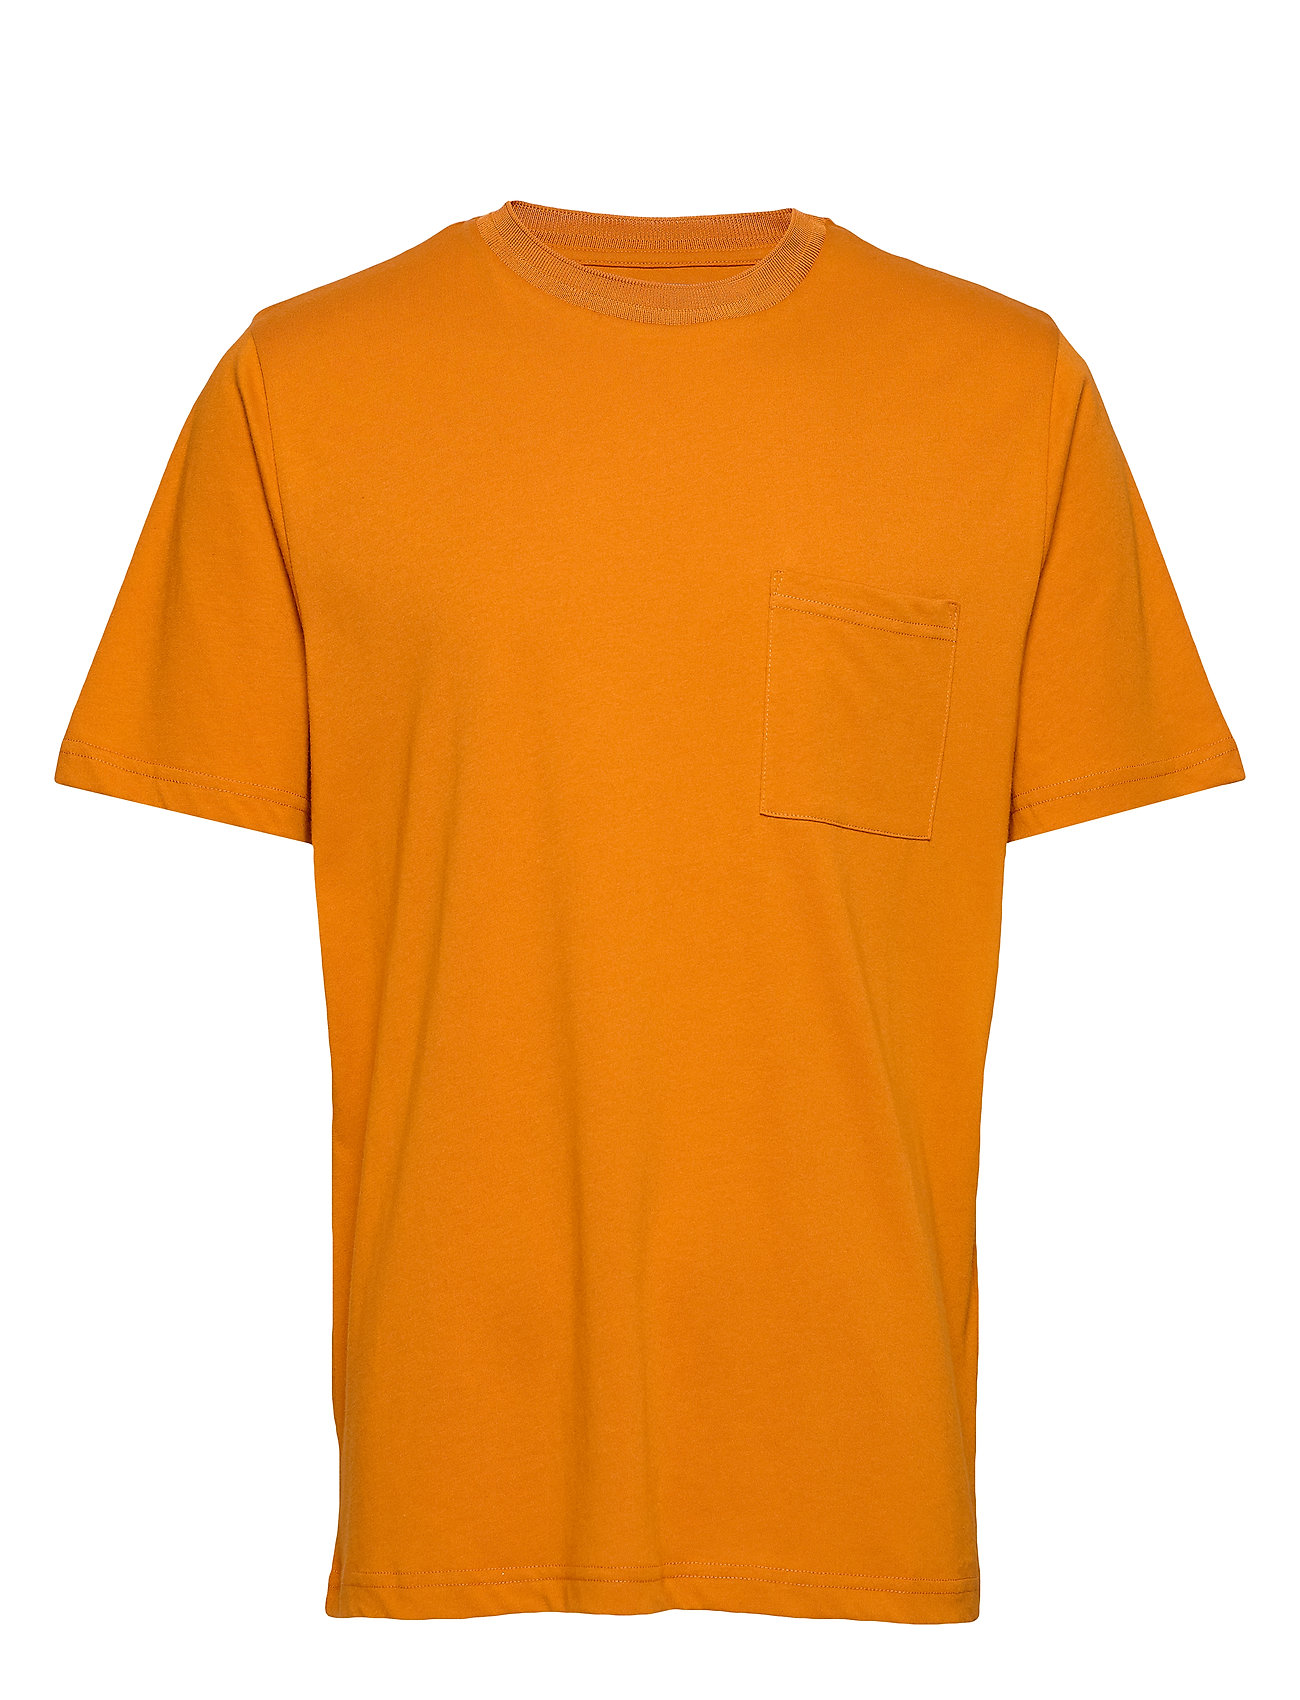 Samsøe & Samsøe Bevtoft t-shirt 10964 - HONEY GINGER